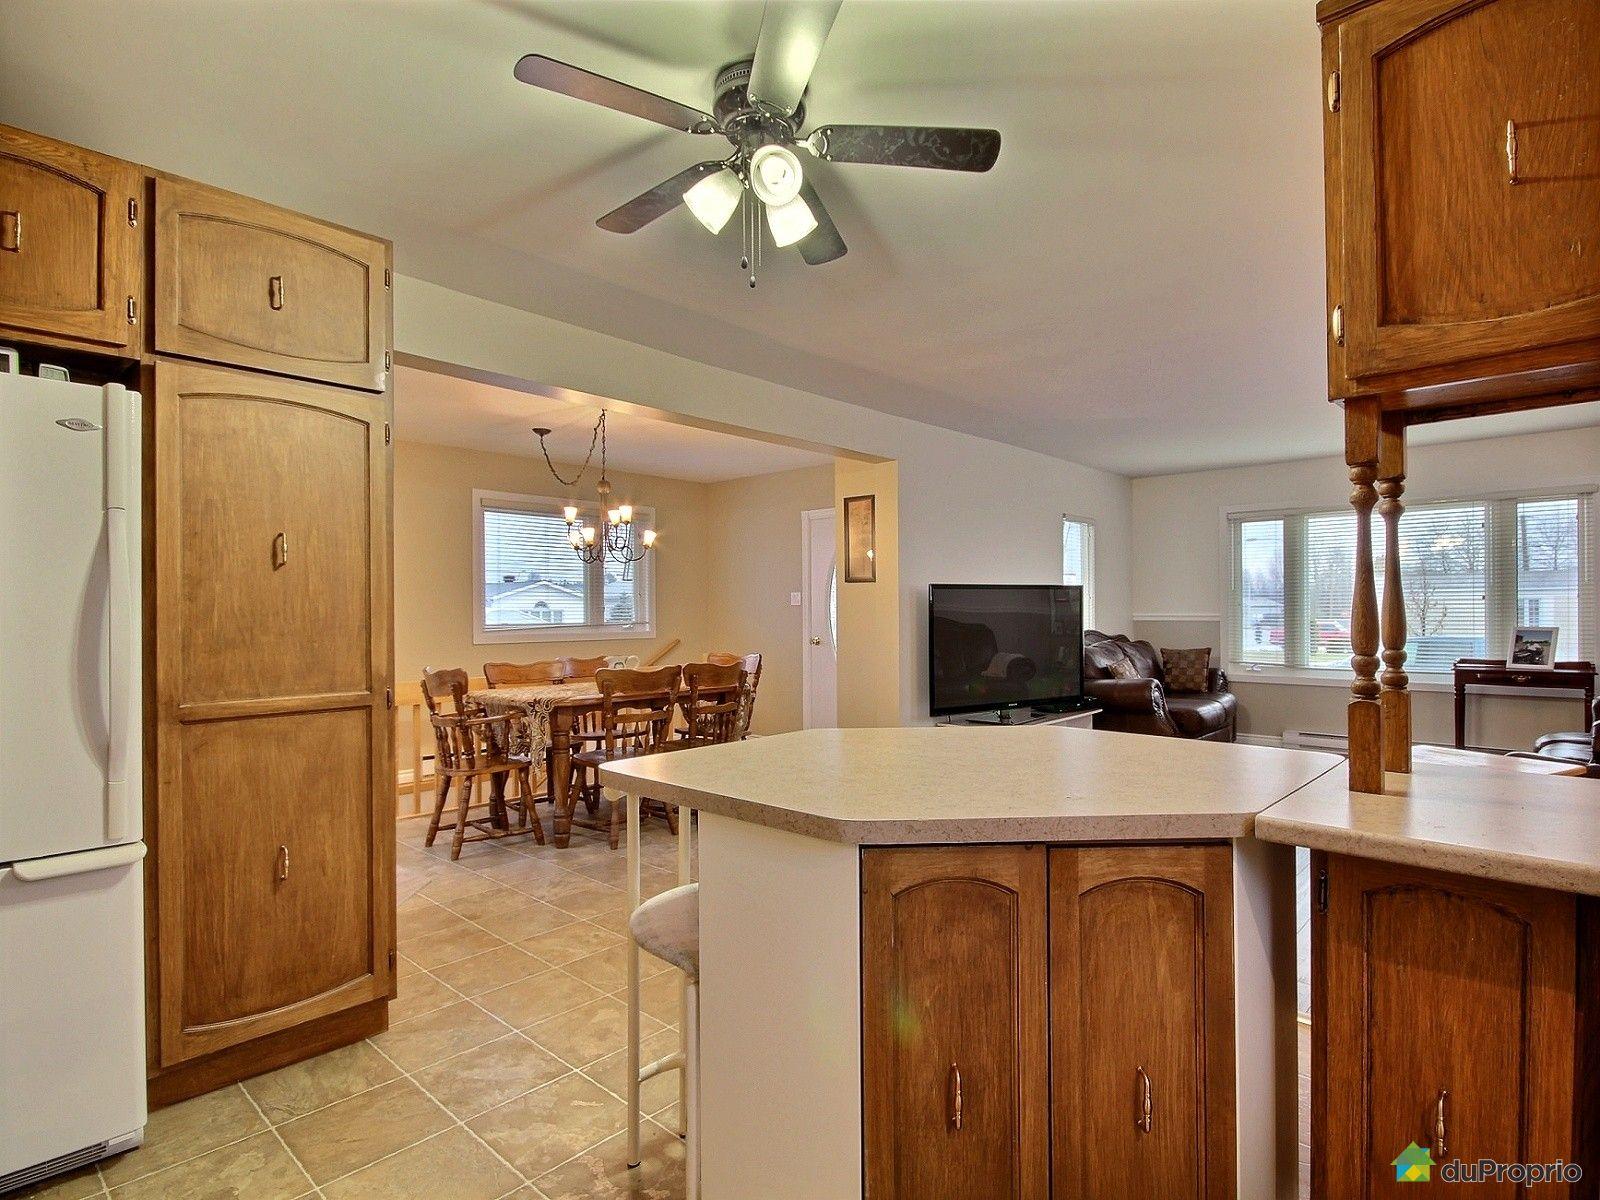 maison vendu dolbeau mistassini immobilier qu bec duproprio 507984. Black Bedroom Furniture Sets. Home Design Ideas